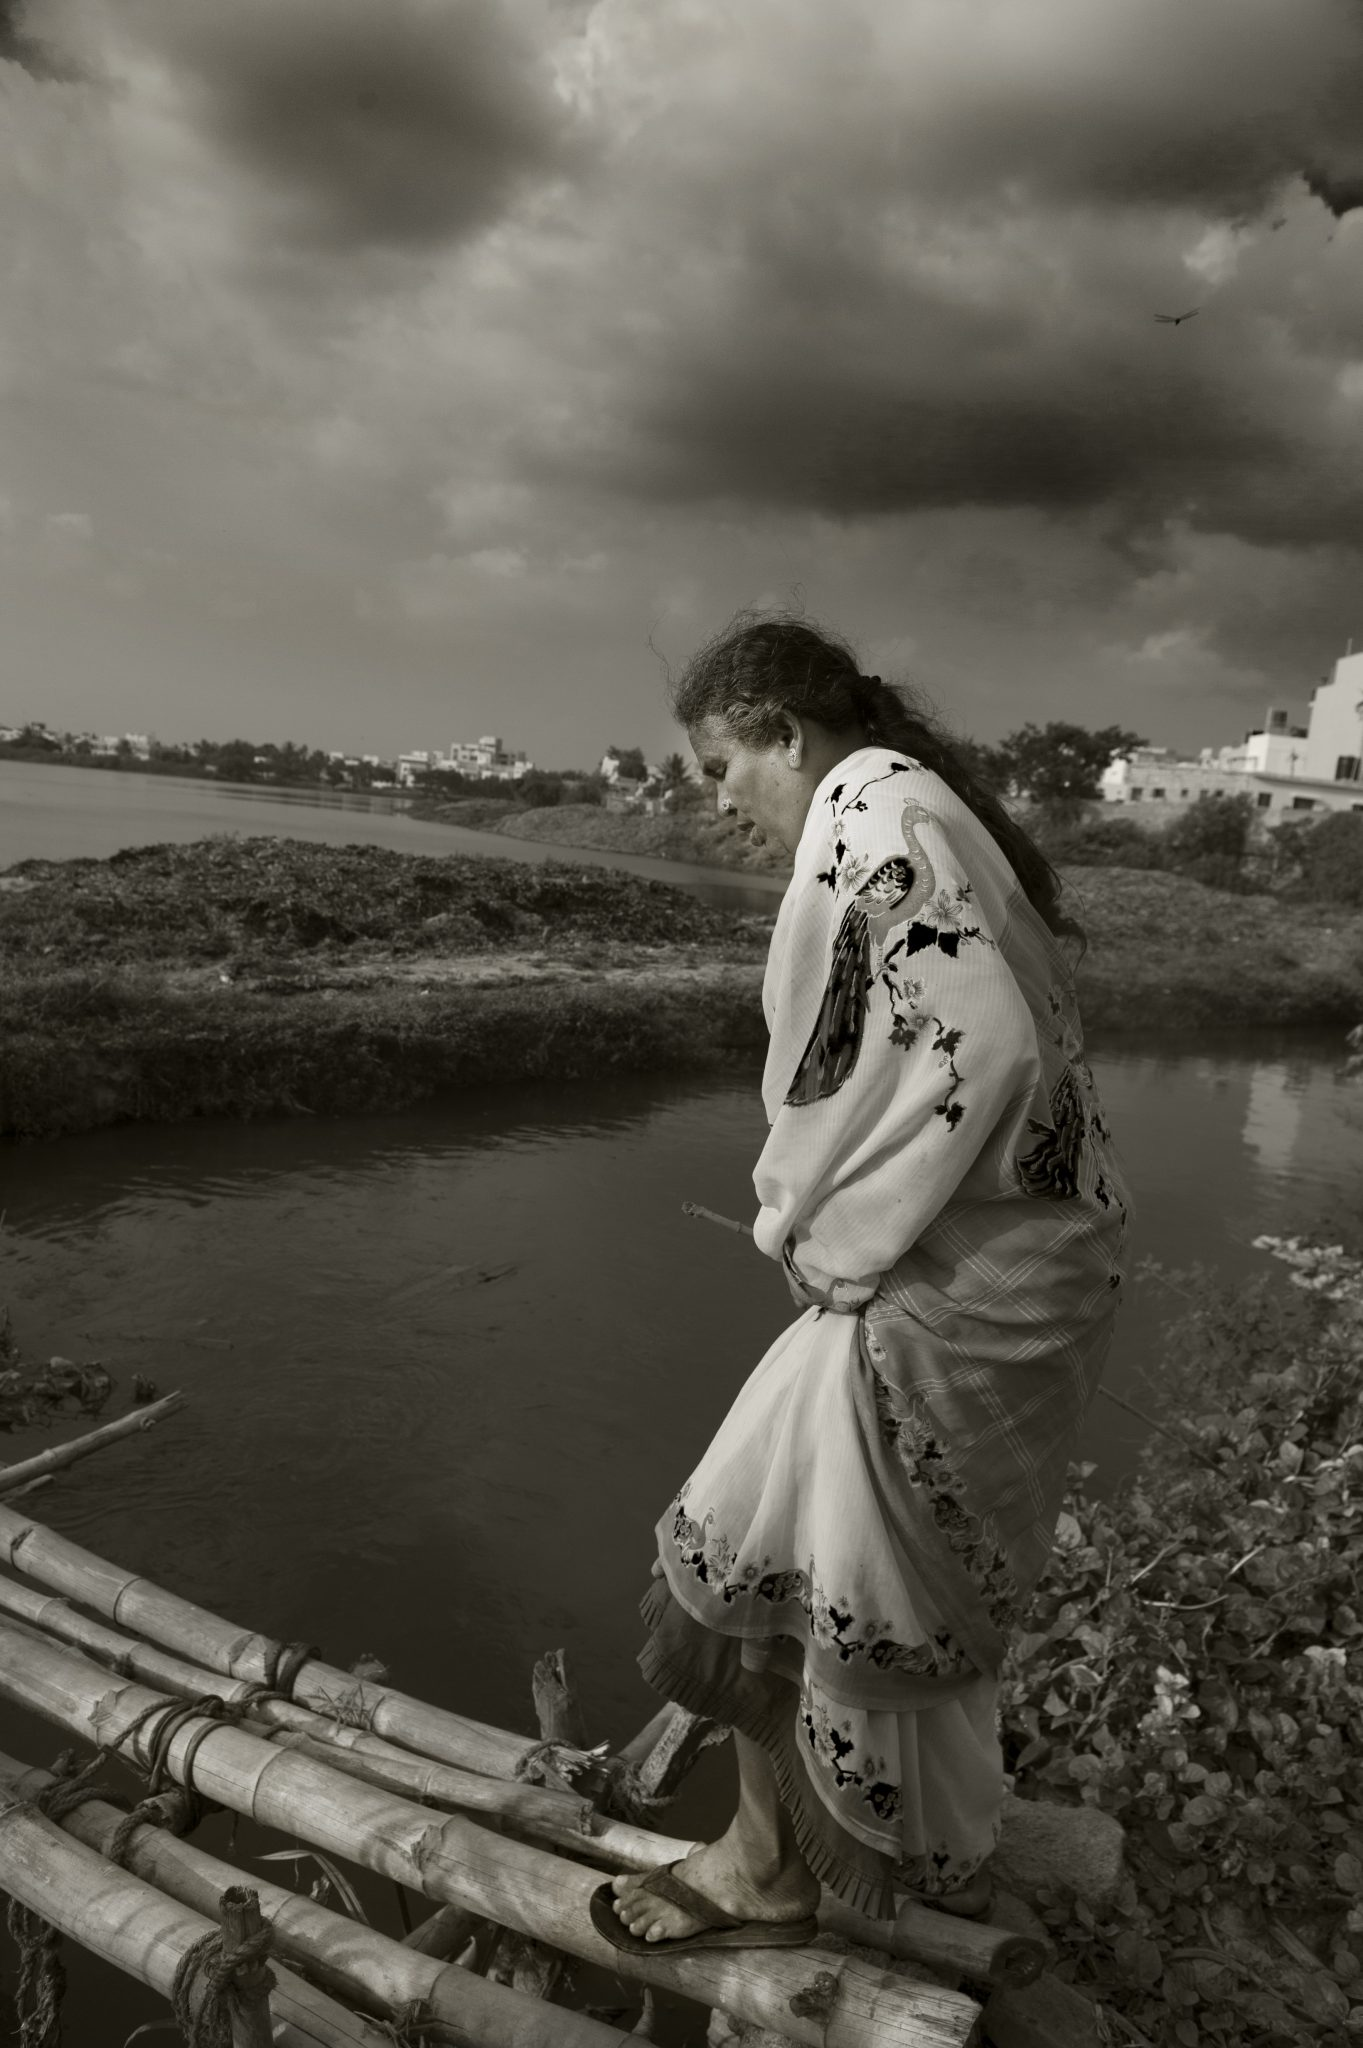 lake_madivala_rajamma_PhotoBy_Arati Kumar-Rao